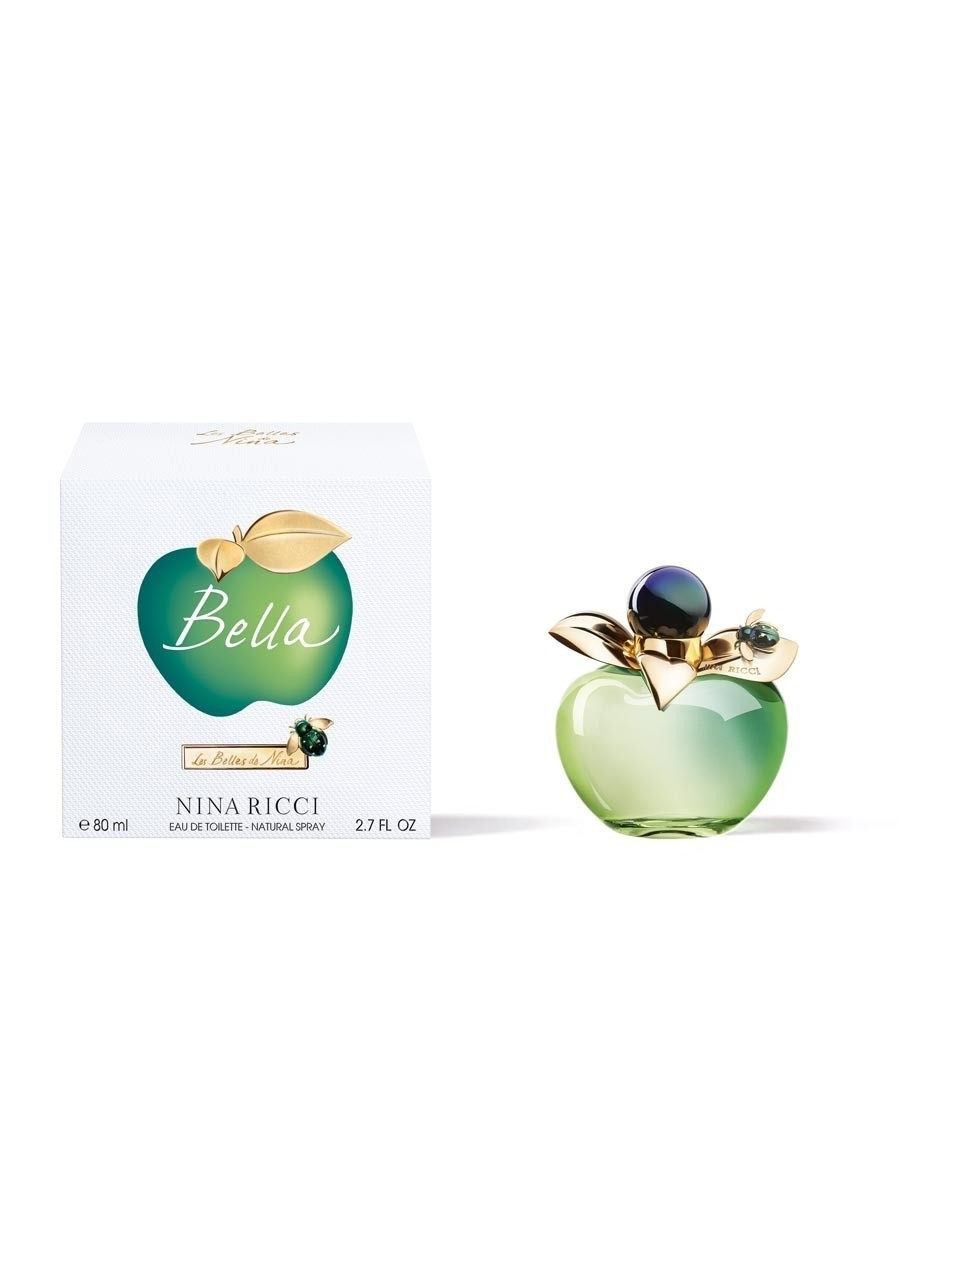 Nina Ricci Bella аромат для женщин